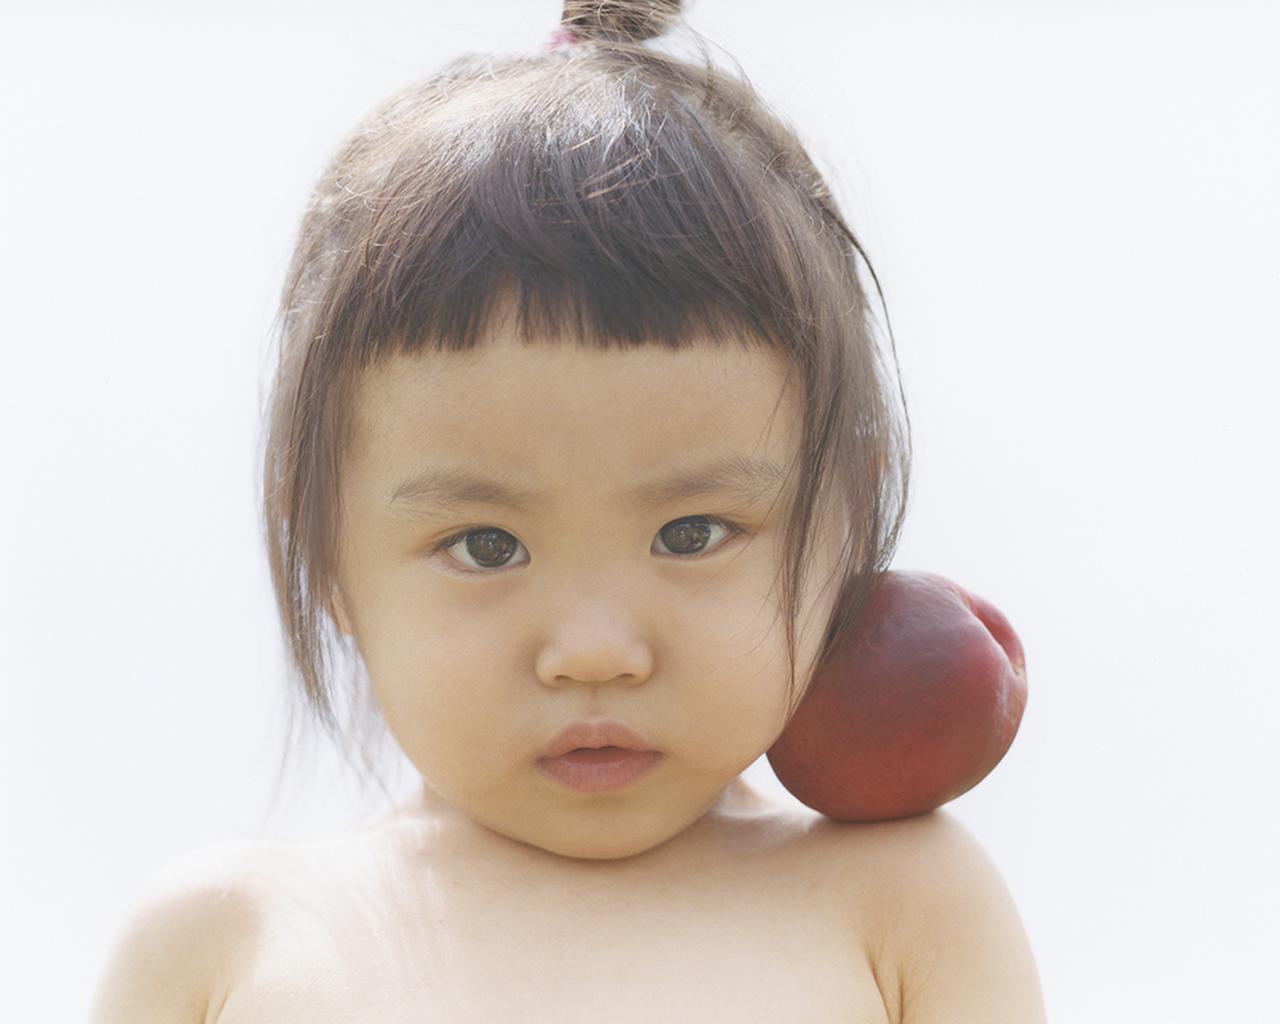 Images : 3番目の画像 - 「TJ News ポートレートの可能性を探る 写真家・横浪 修の新作展」のアルバム - T JAPAN:The New York Times Style Magazine 公式サイト